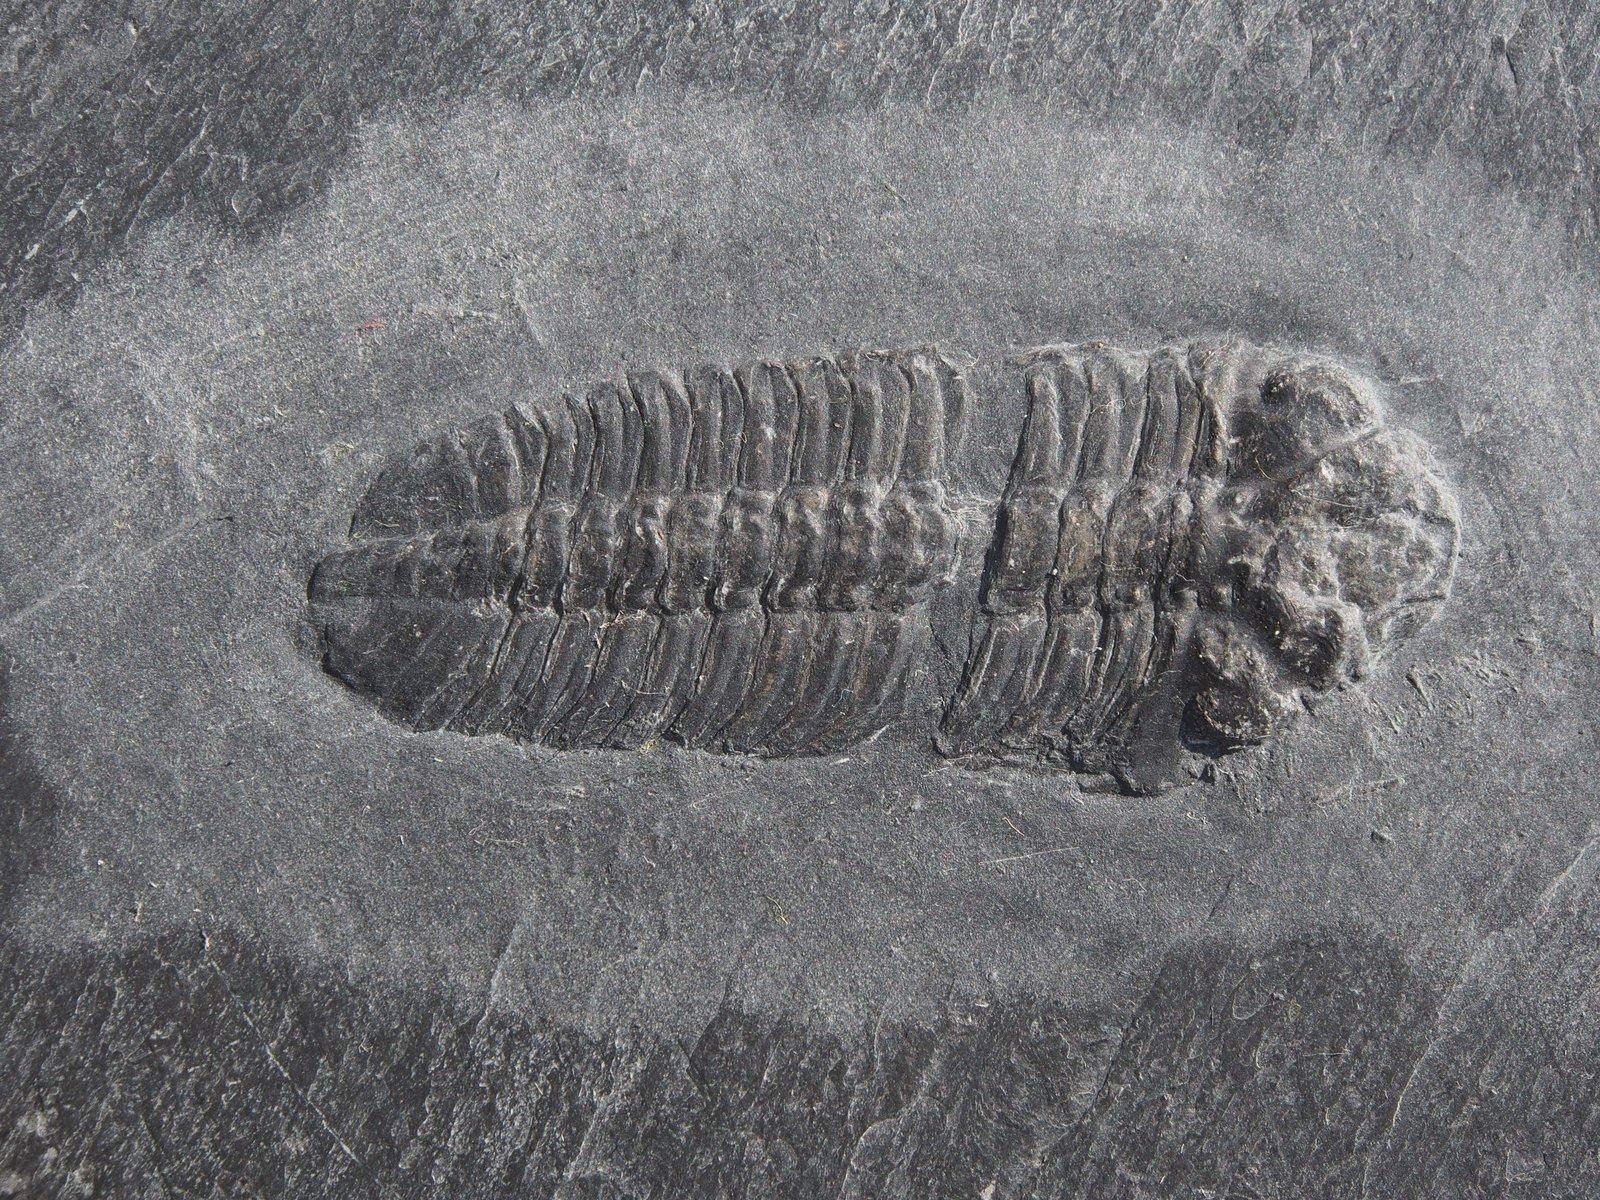 Trilobite non det